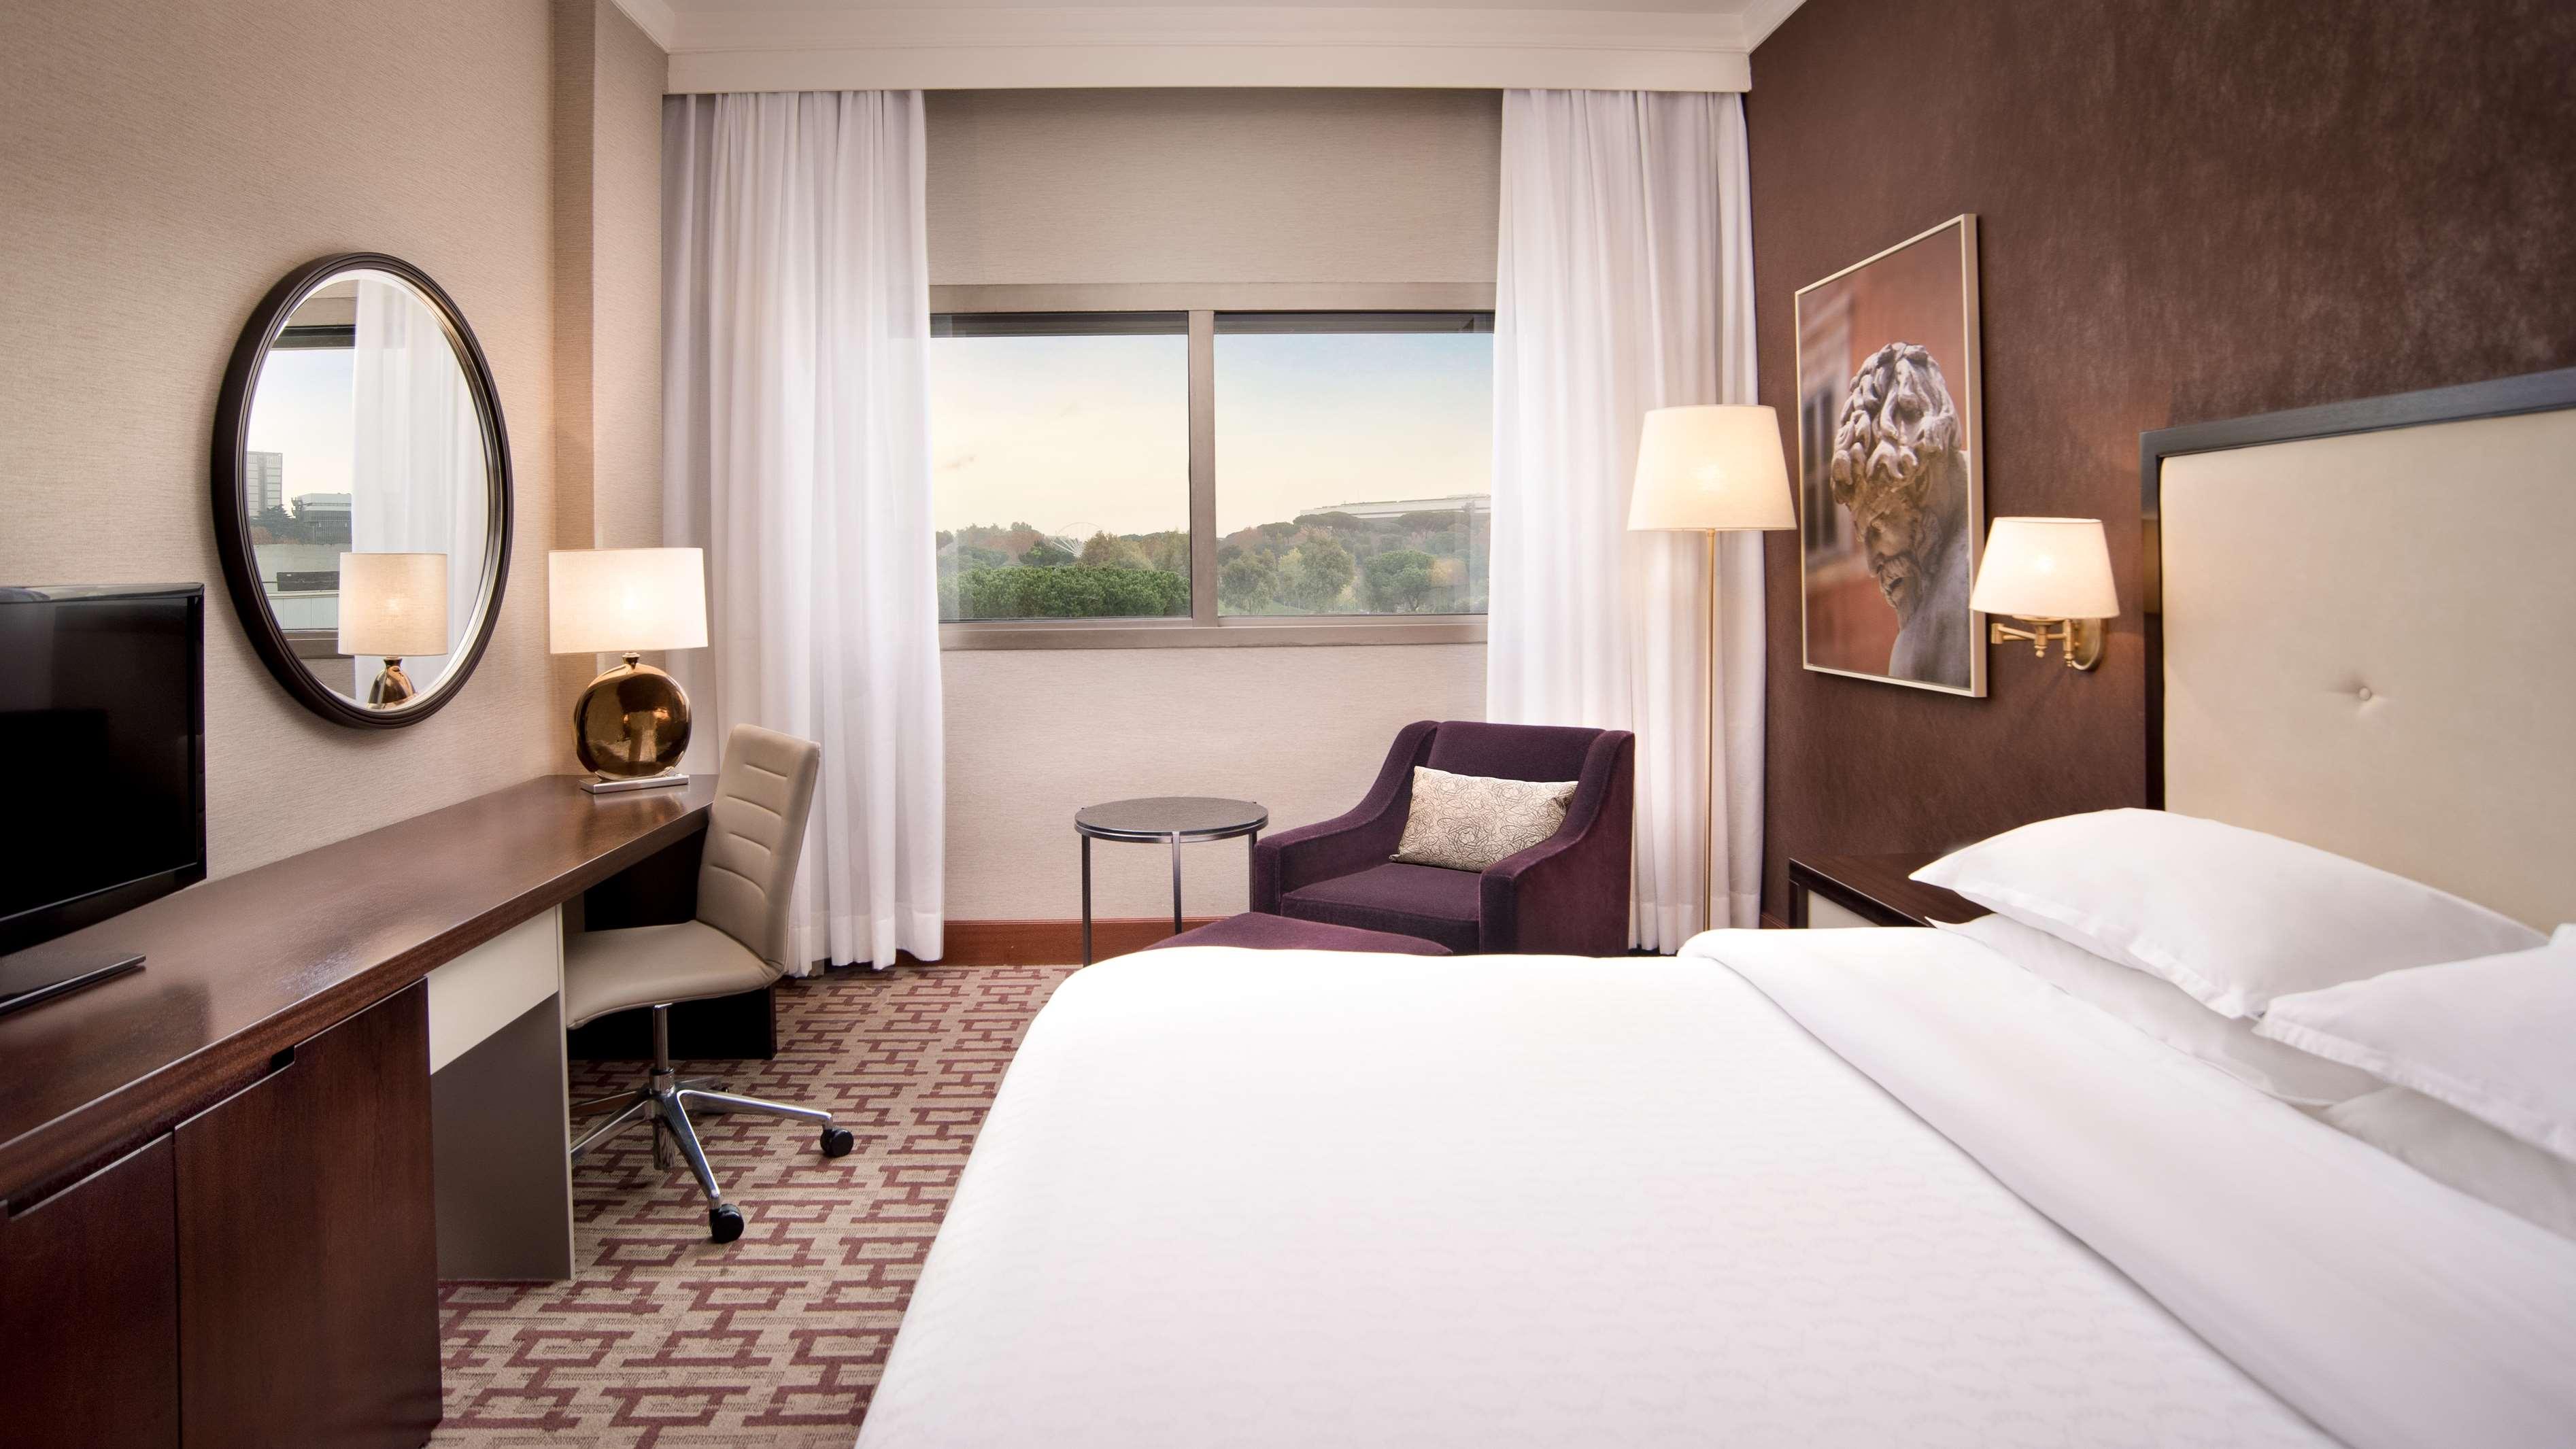 Sheraton roma hotel conference center alberghi for Roma business center